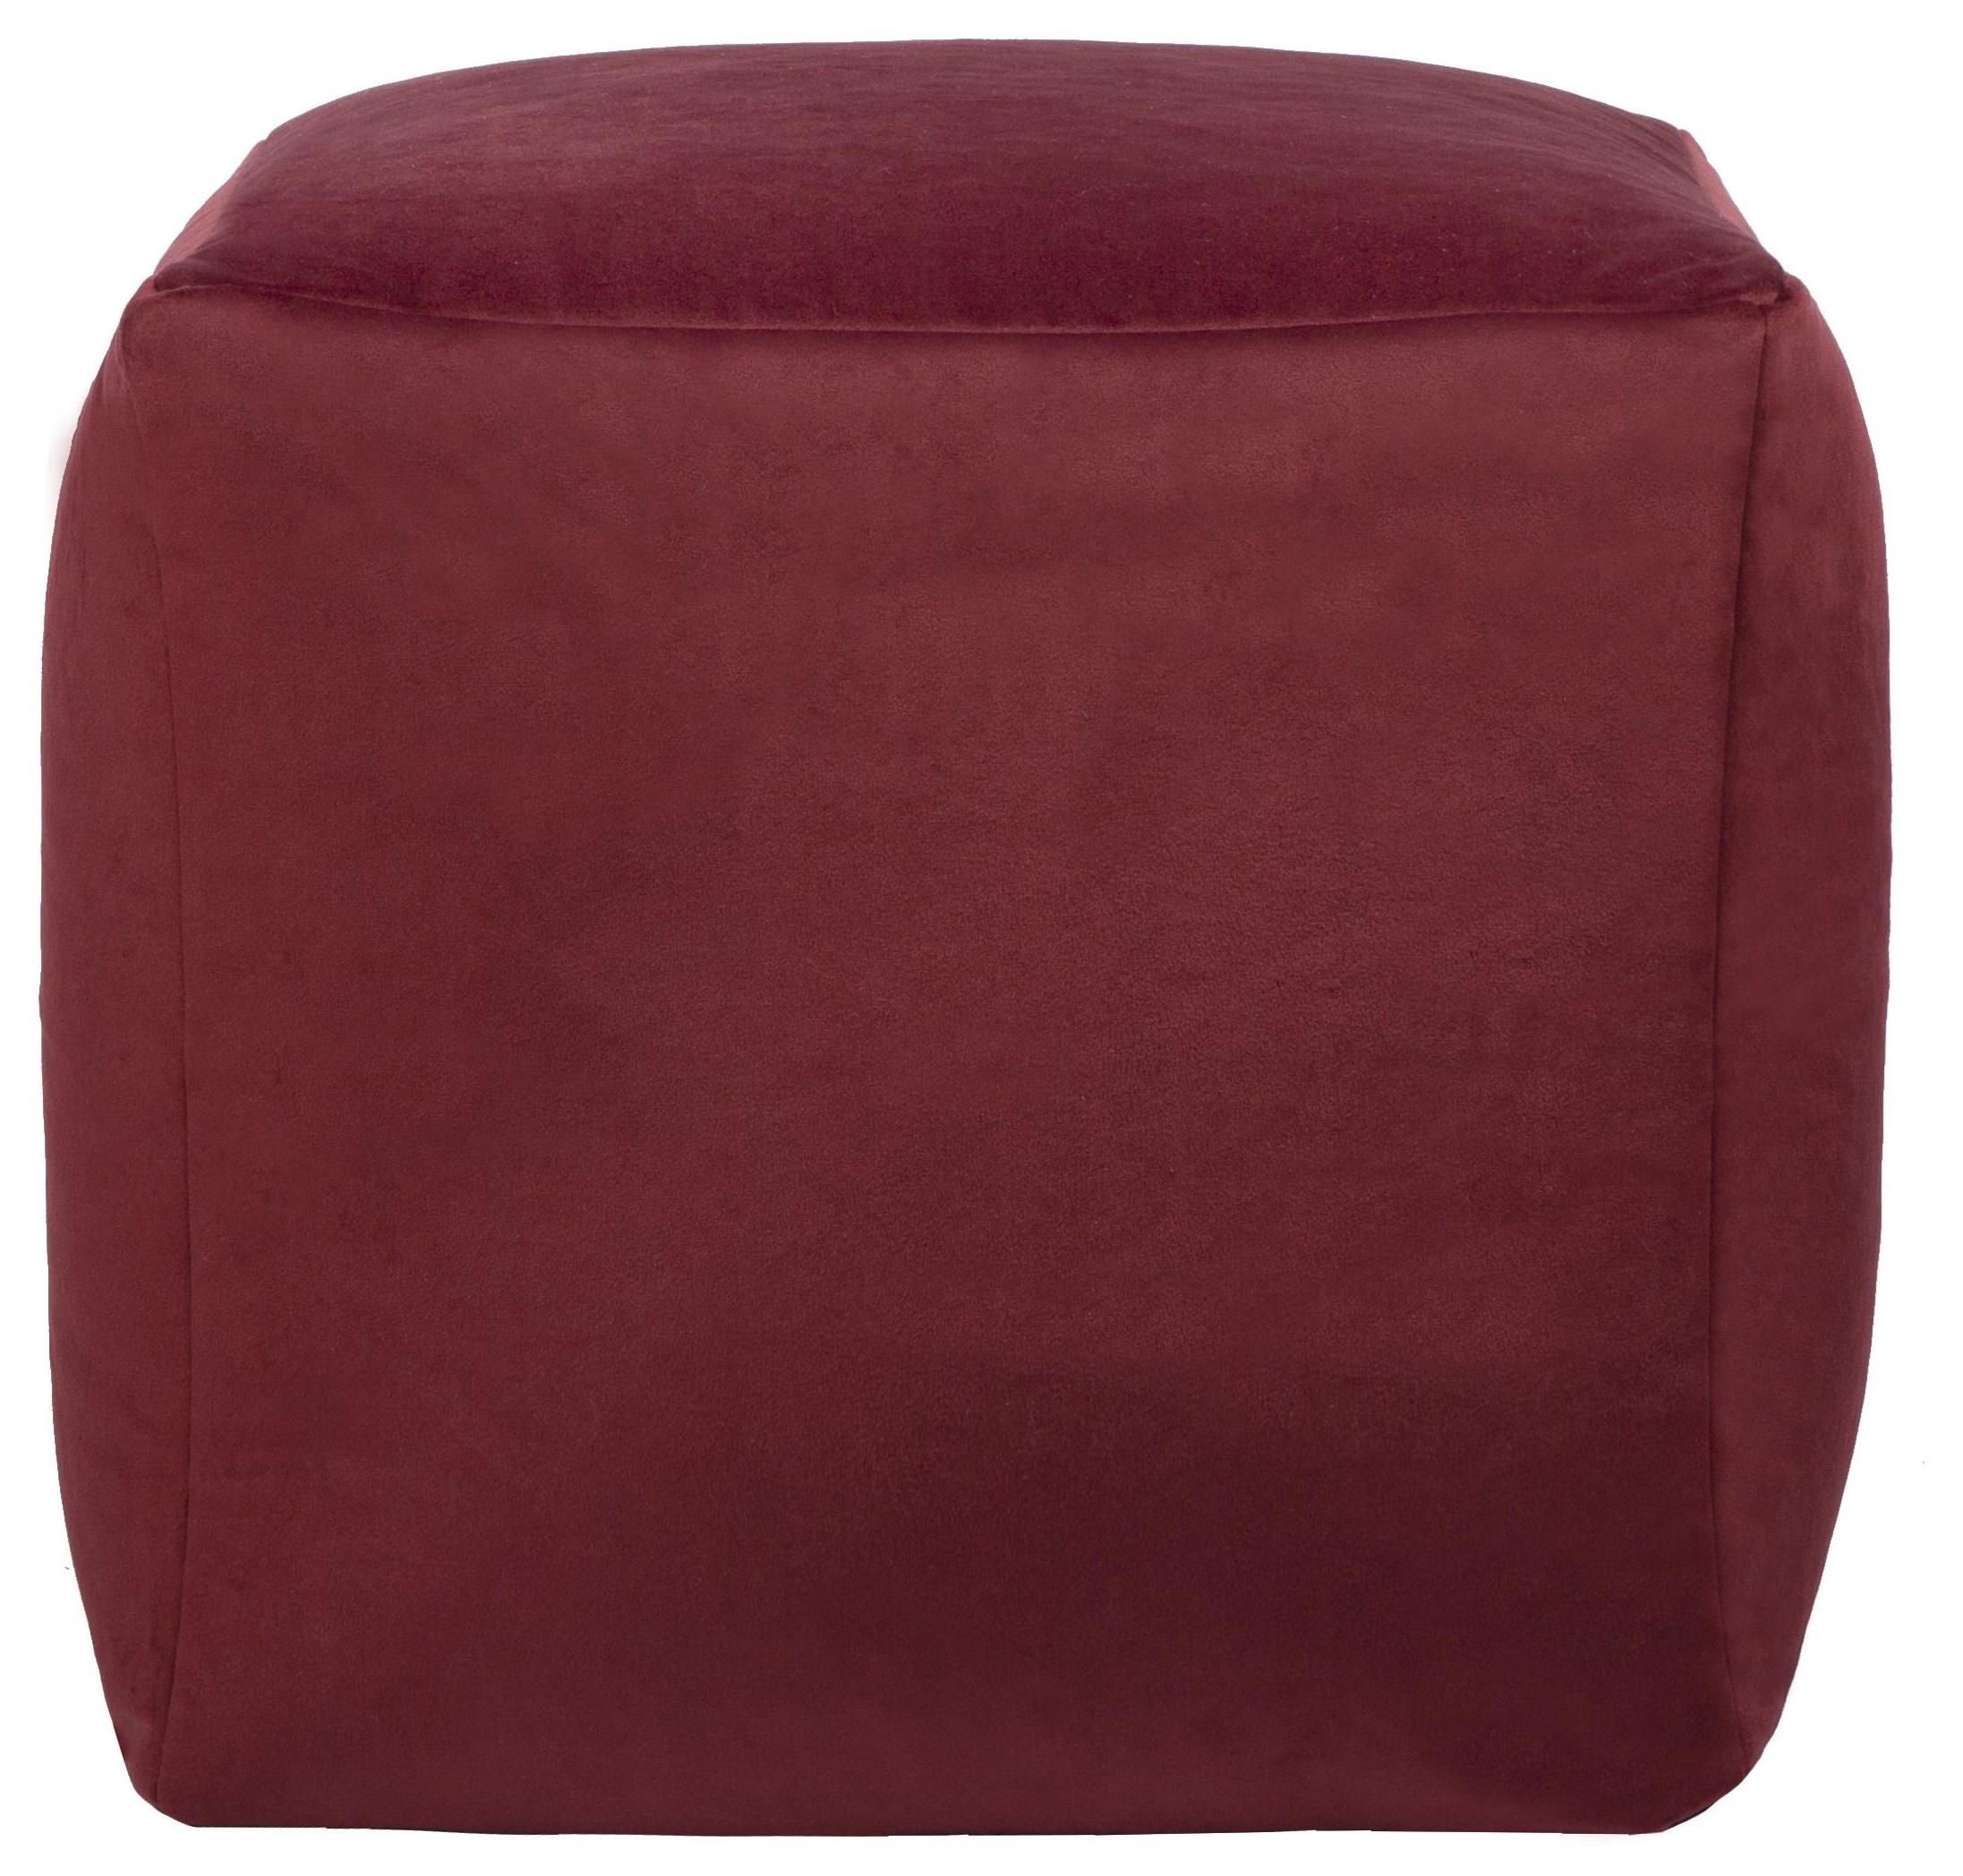 Beanbag Red Cube Beanbag by Lazy Life Paris at HomeWorld Furniture